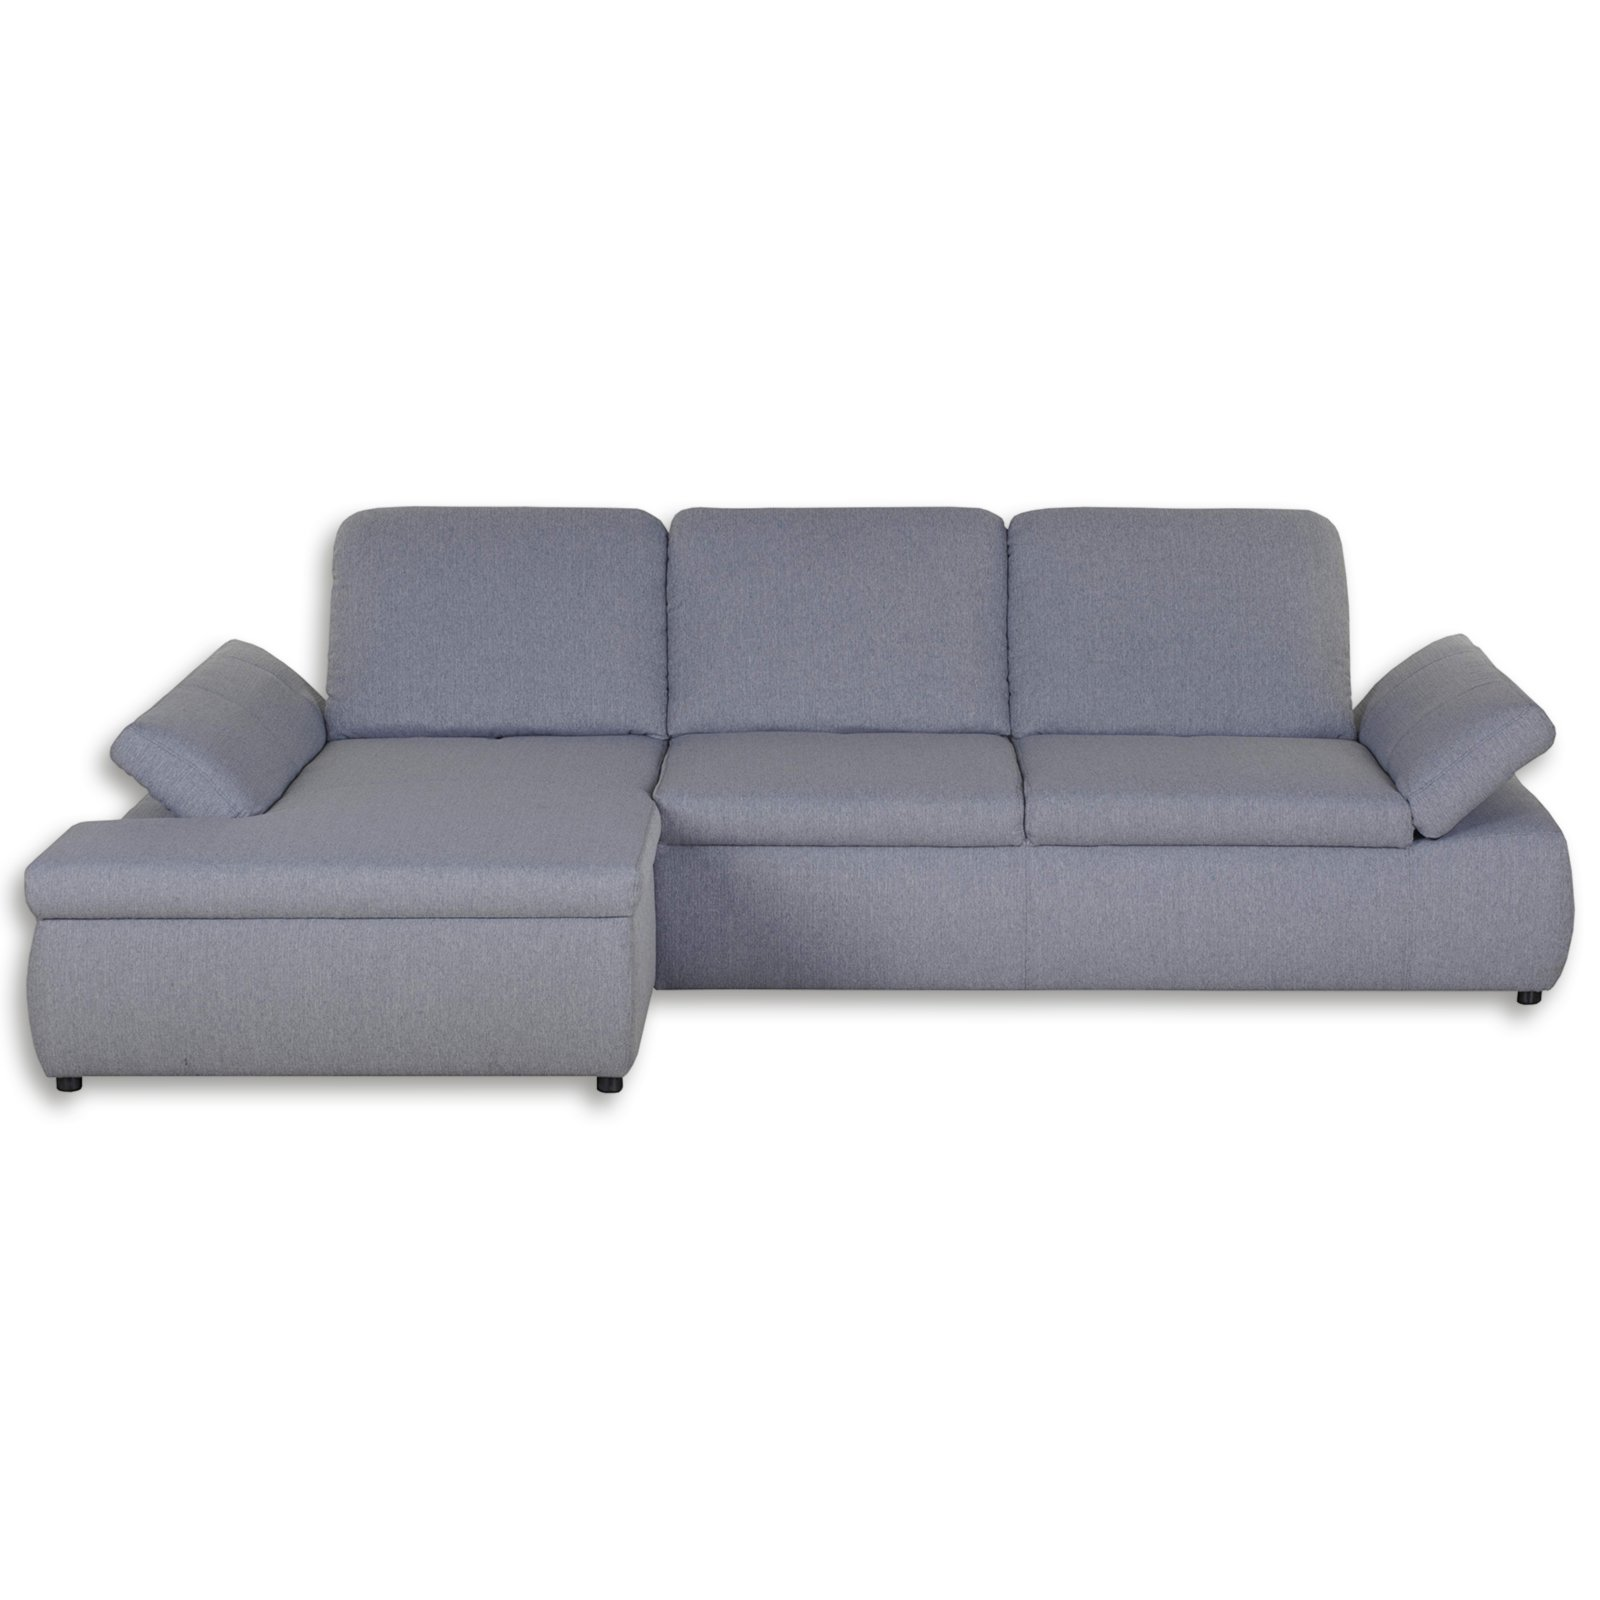 boxspringsofa grau mit funktion recamiere links ecksofas l form sofas couches. Black Bedroom Furniture Sets. Home Design Ideas